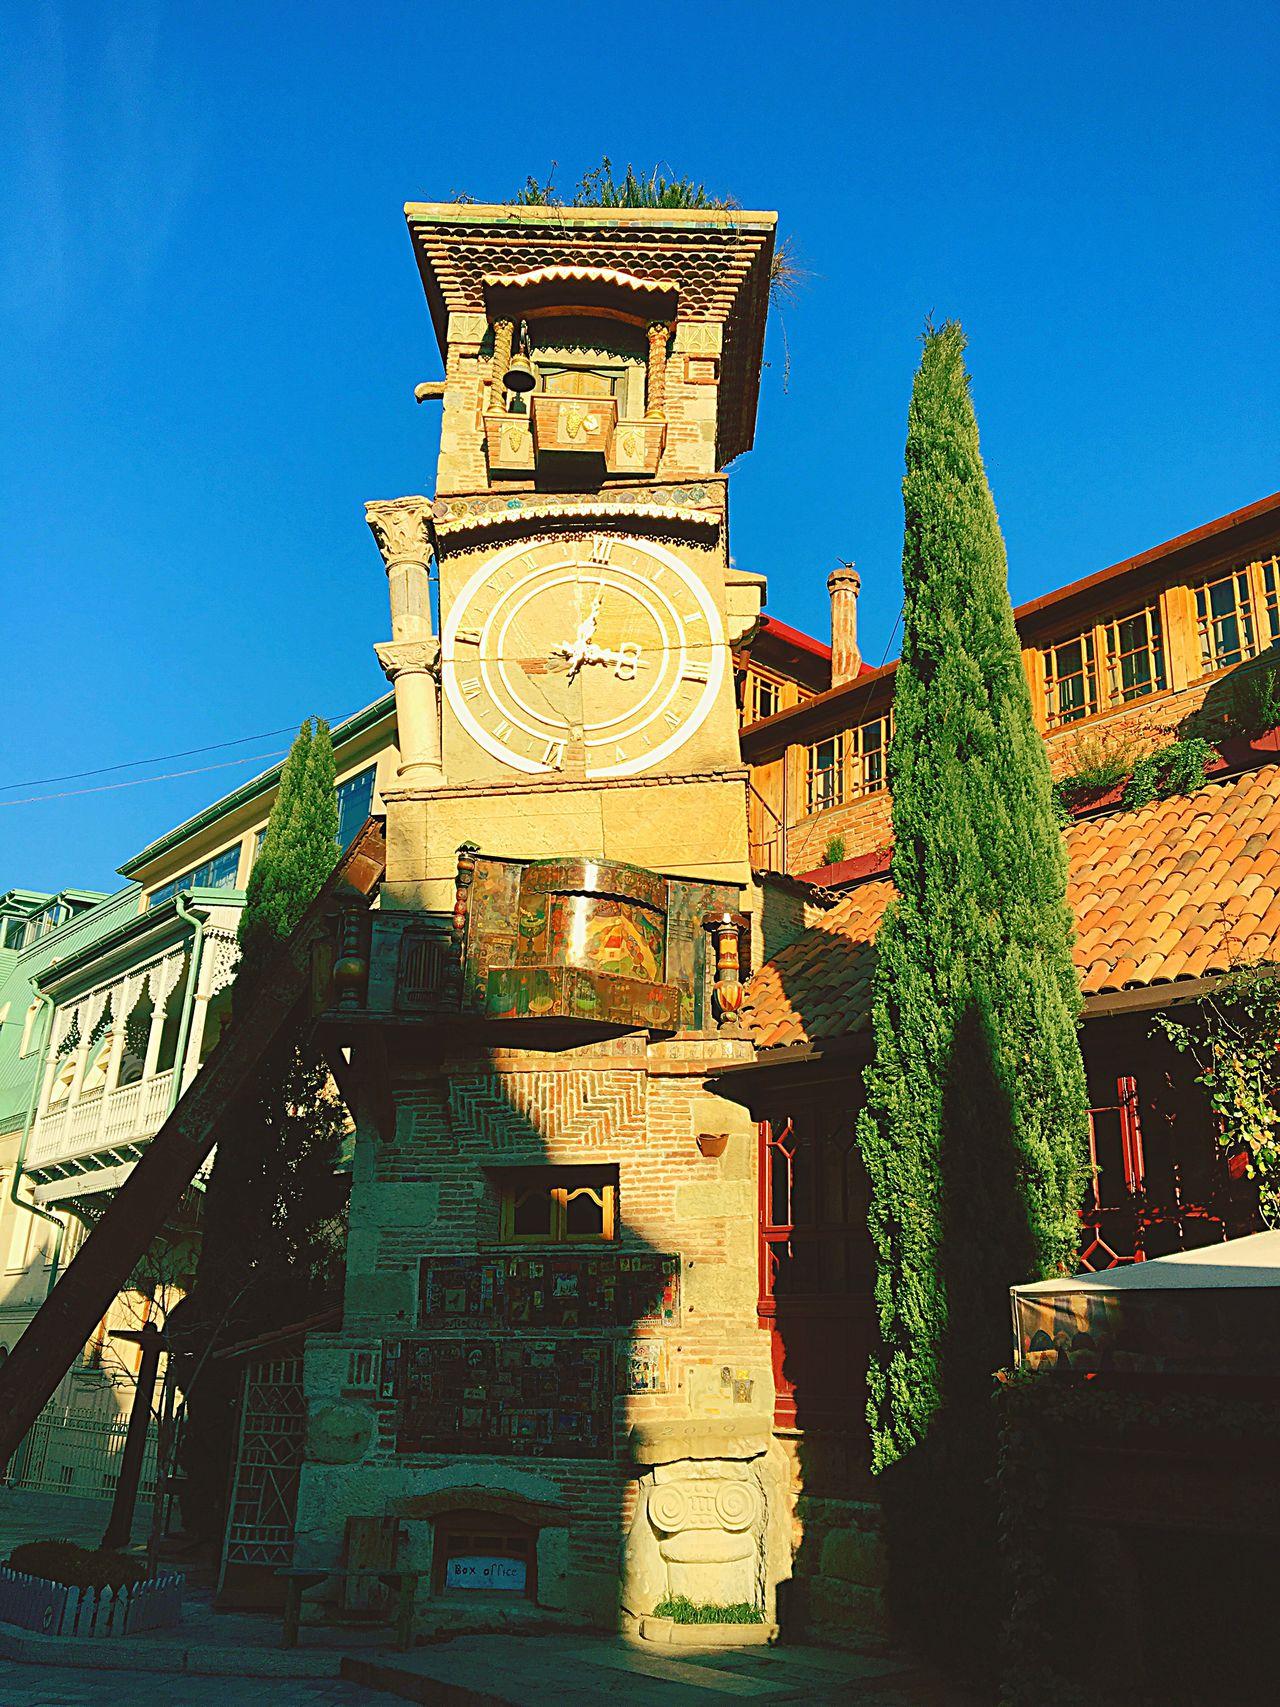 Favourite place in Tbilisi Architecture Gabriadze Georgia Tbilisi Theatre Marionette Puppet